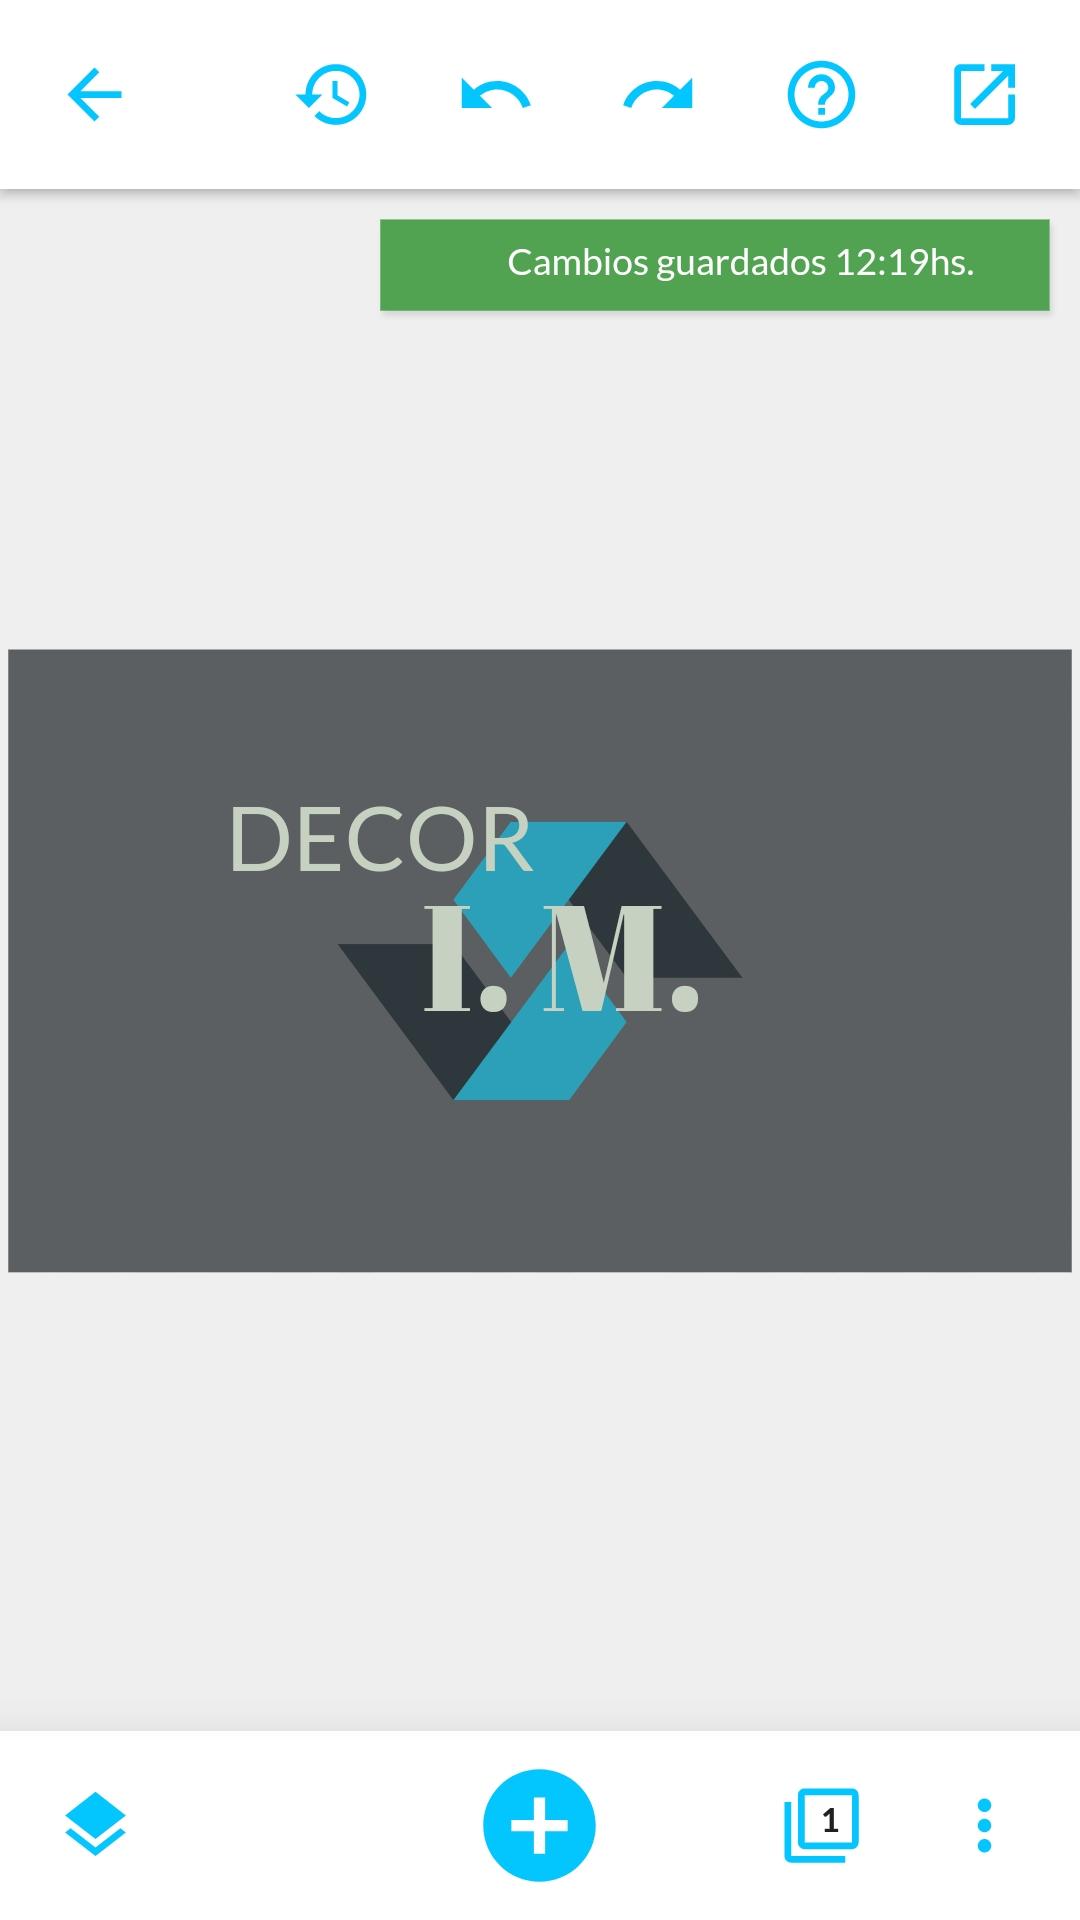 Decor    I.m.